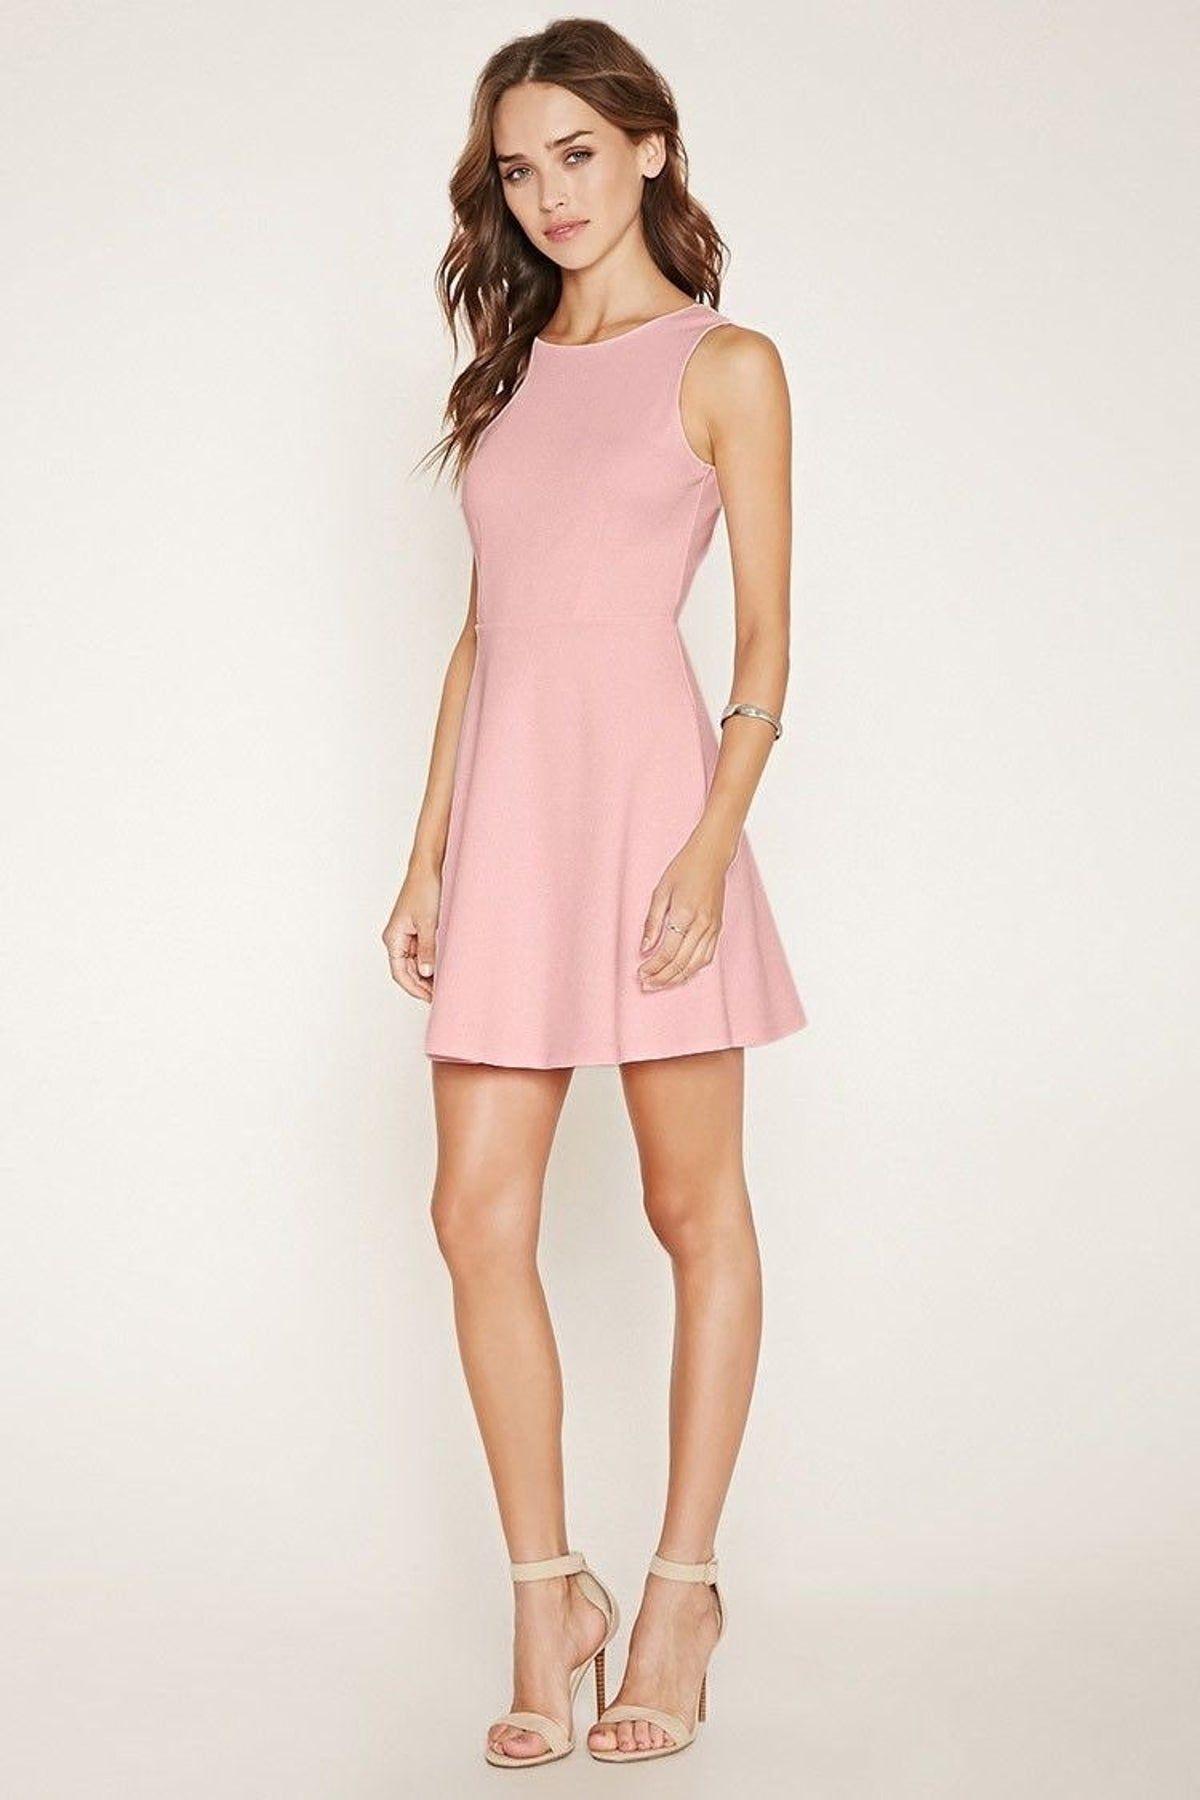 38++ Pink dress forever 21 info